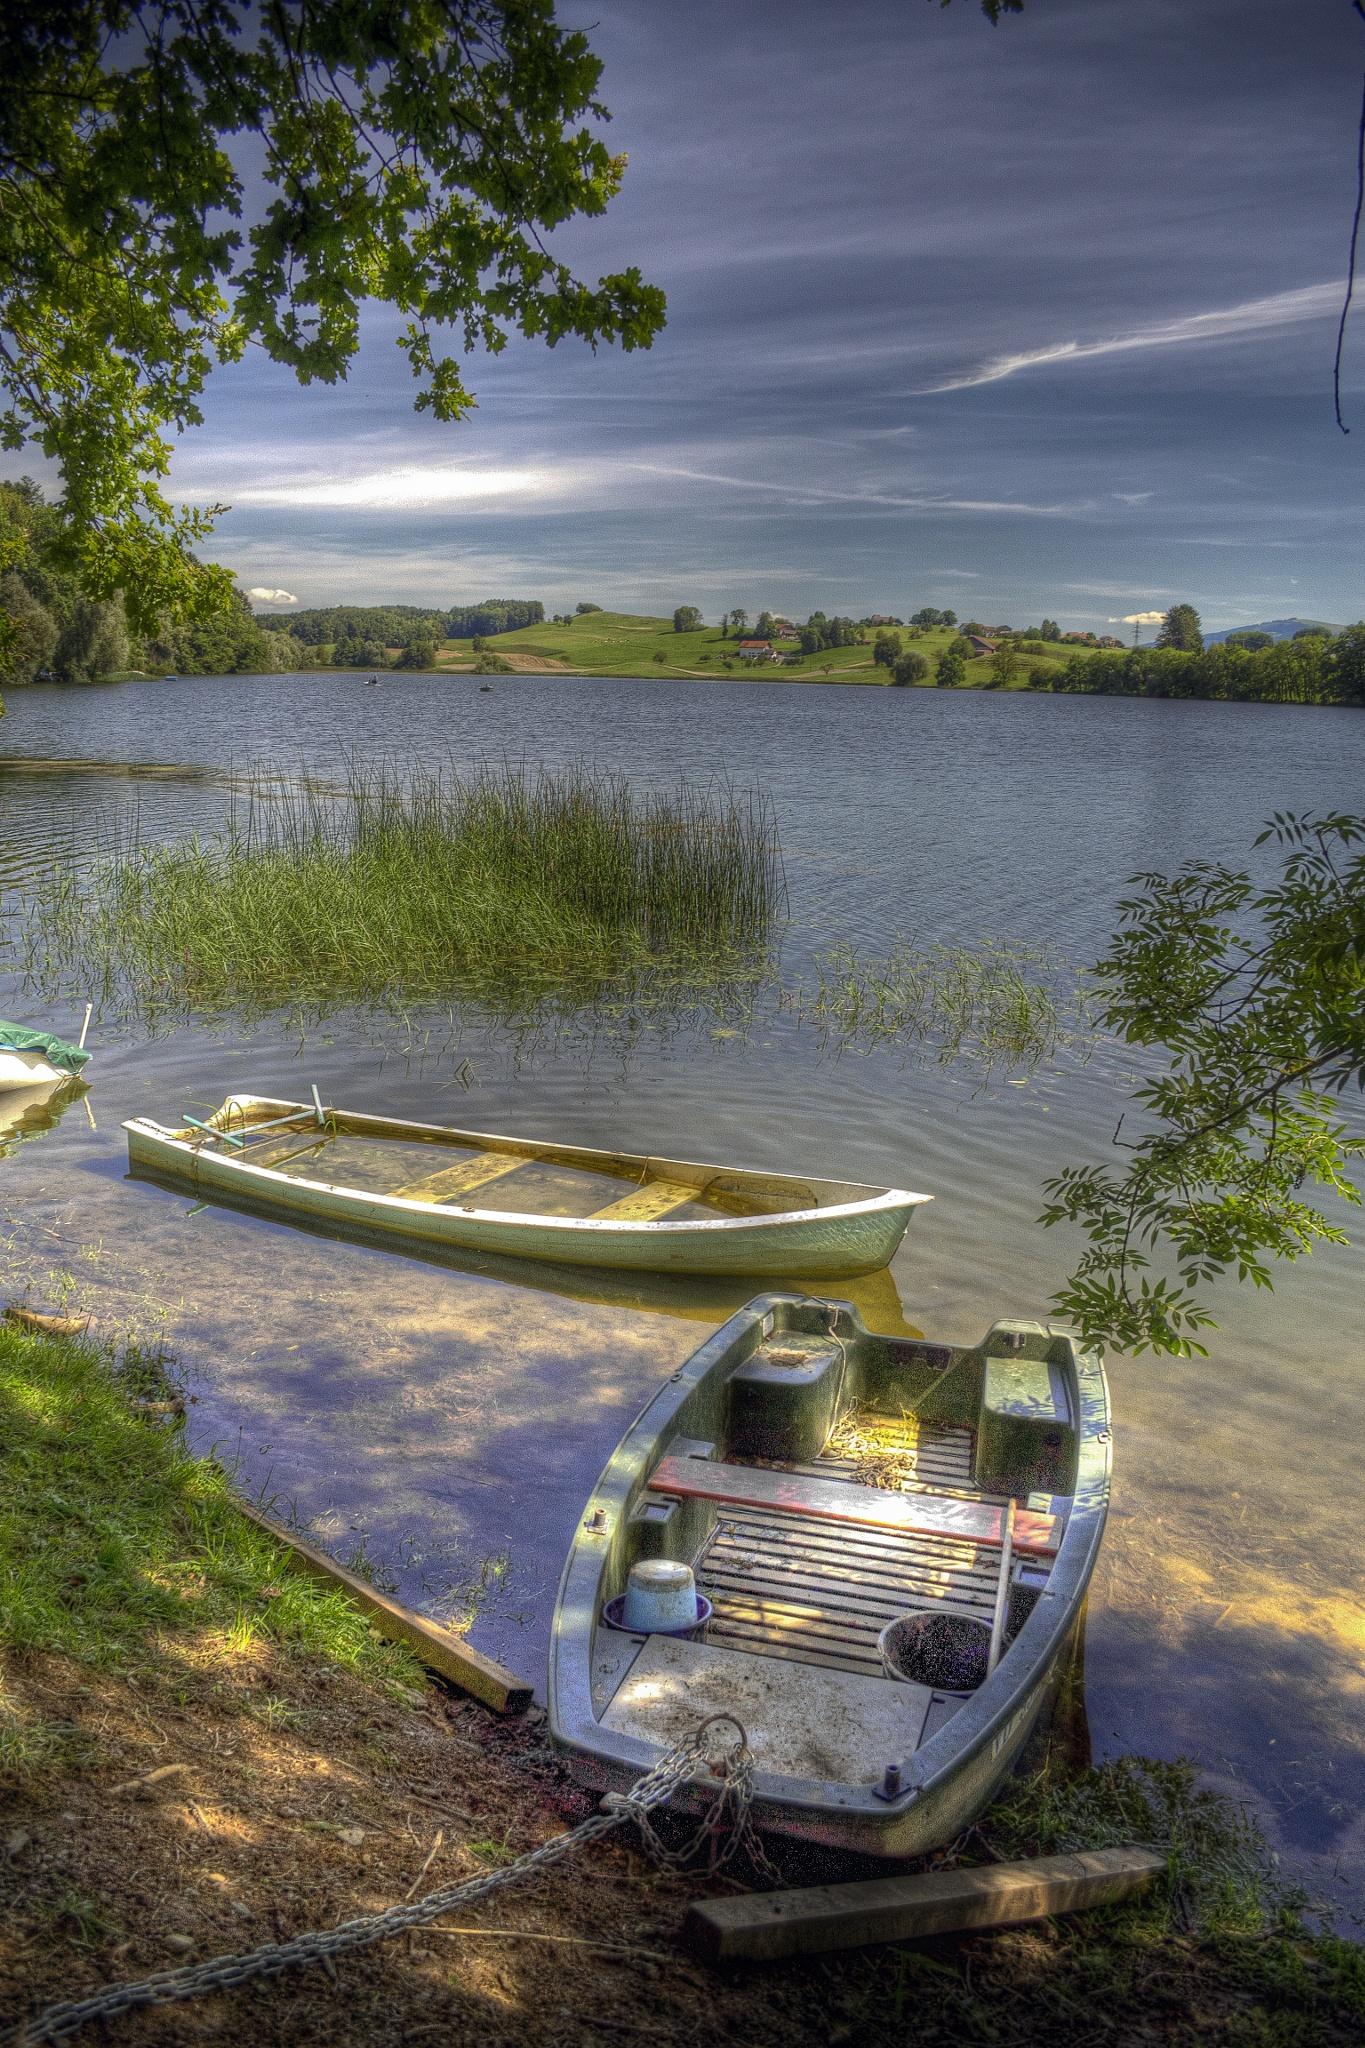 Boats at Lac de Bret by MarieJirousek